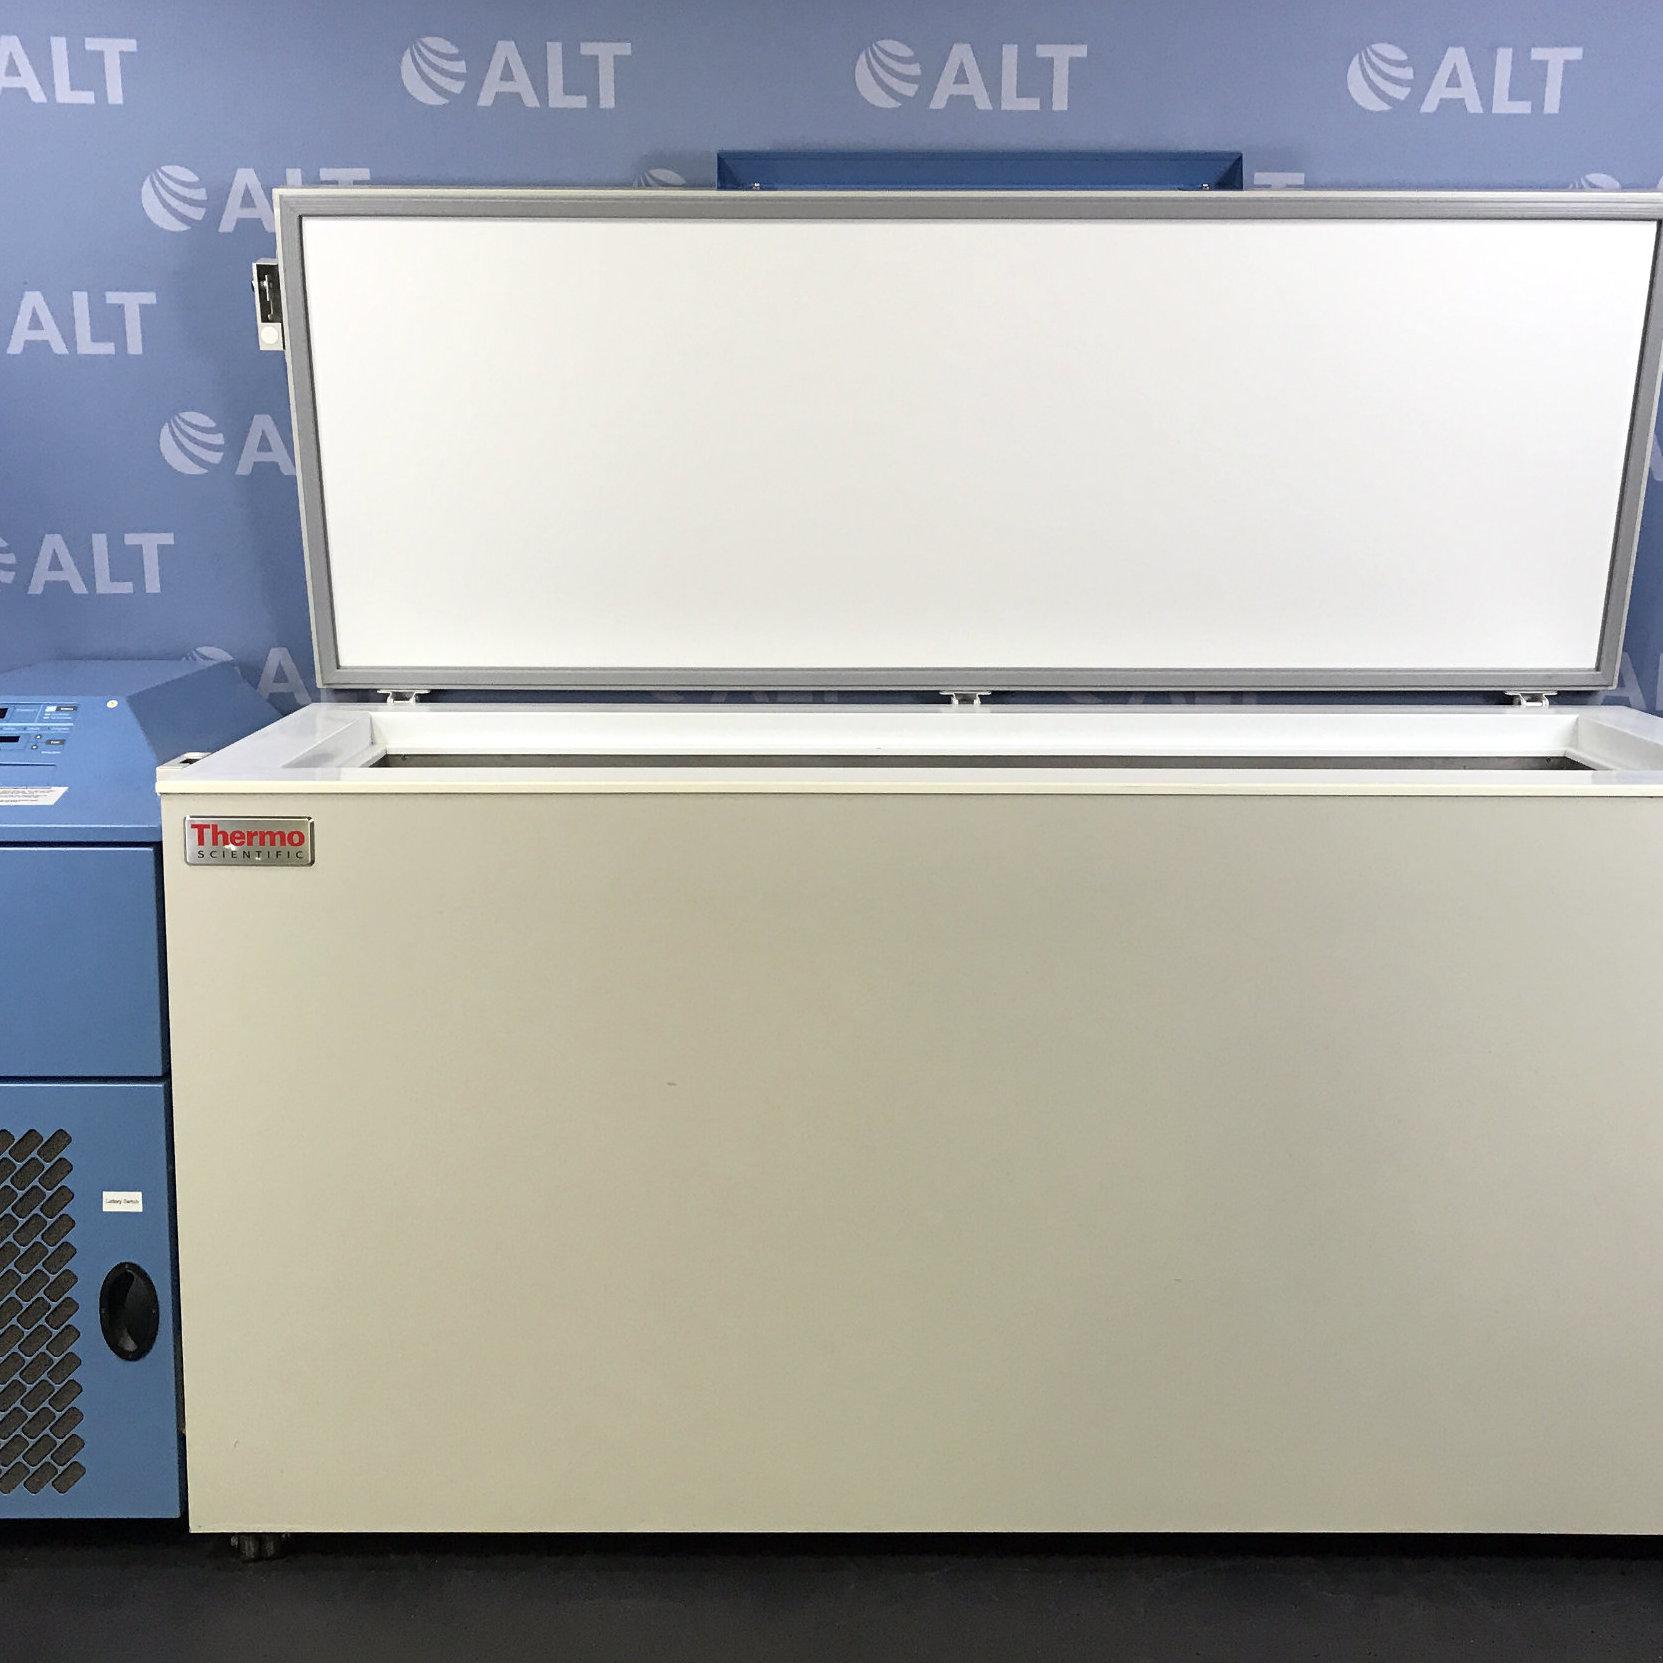 Thermo Scientific Model 5820 Ultra-Low Temperature Chest Freezer Image